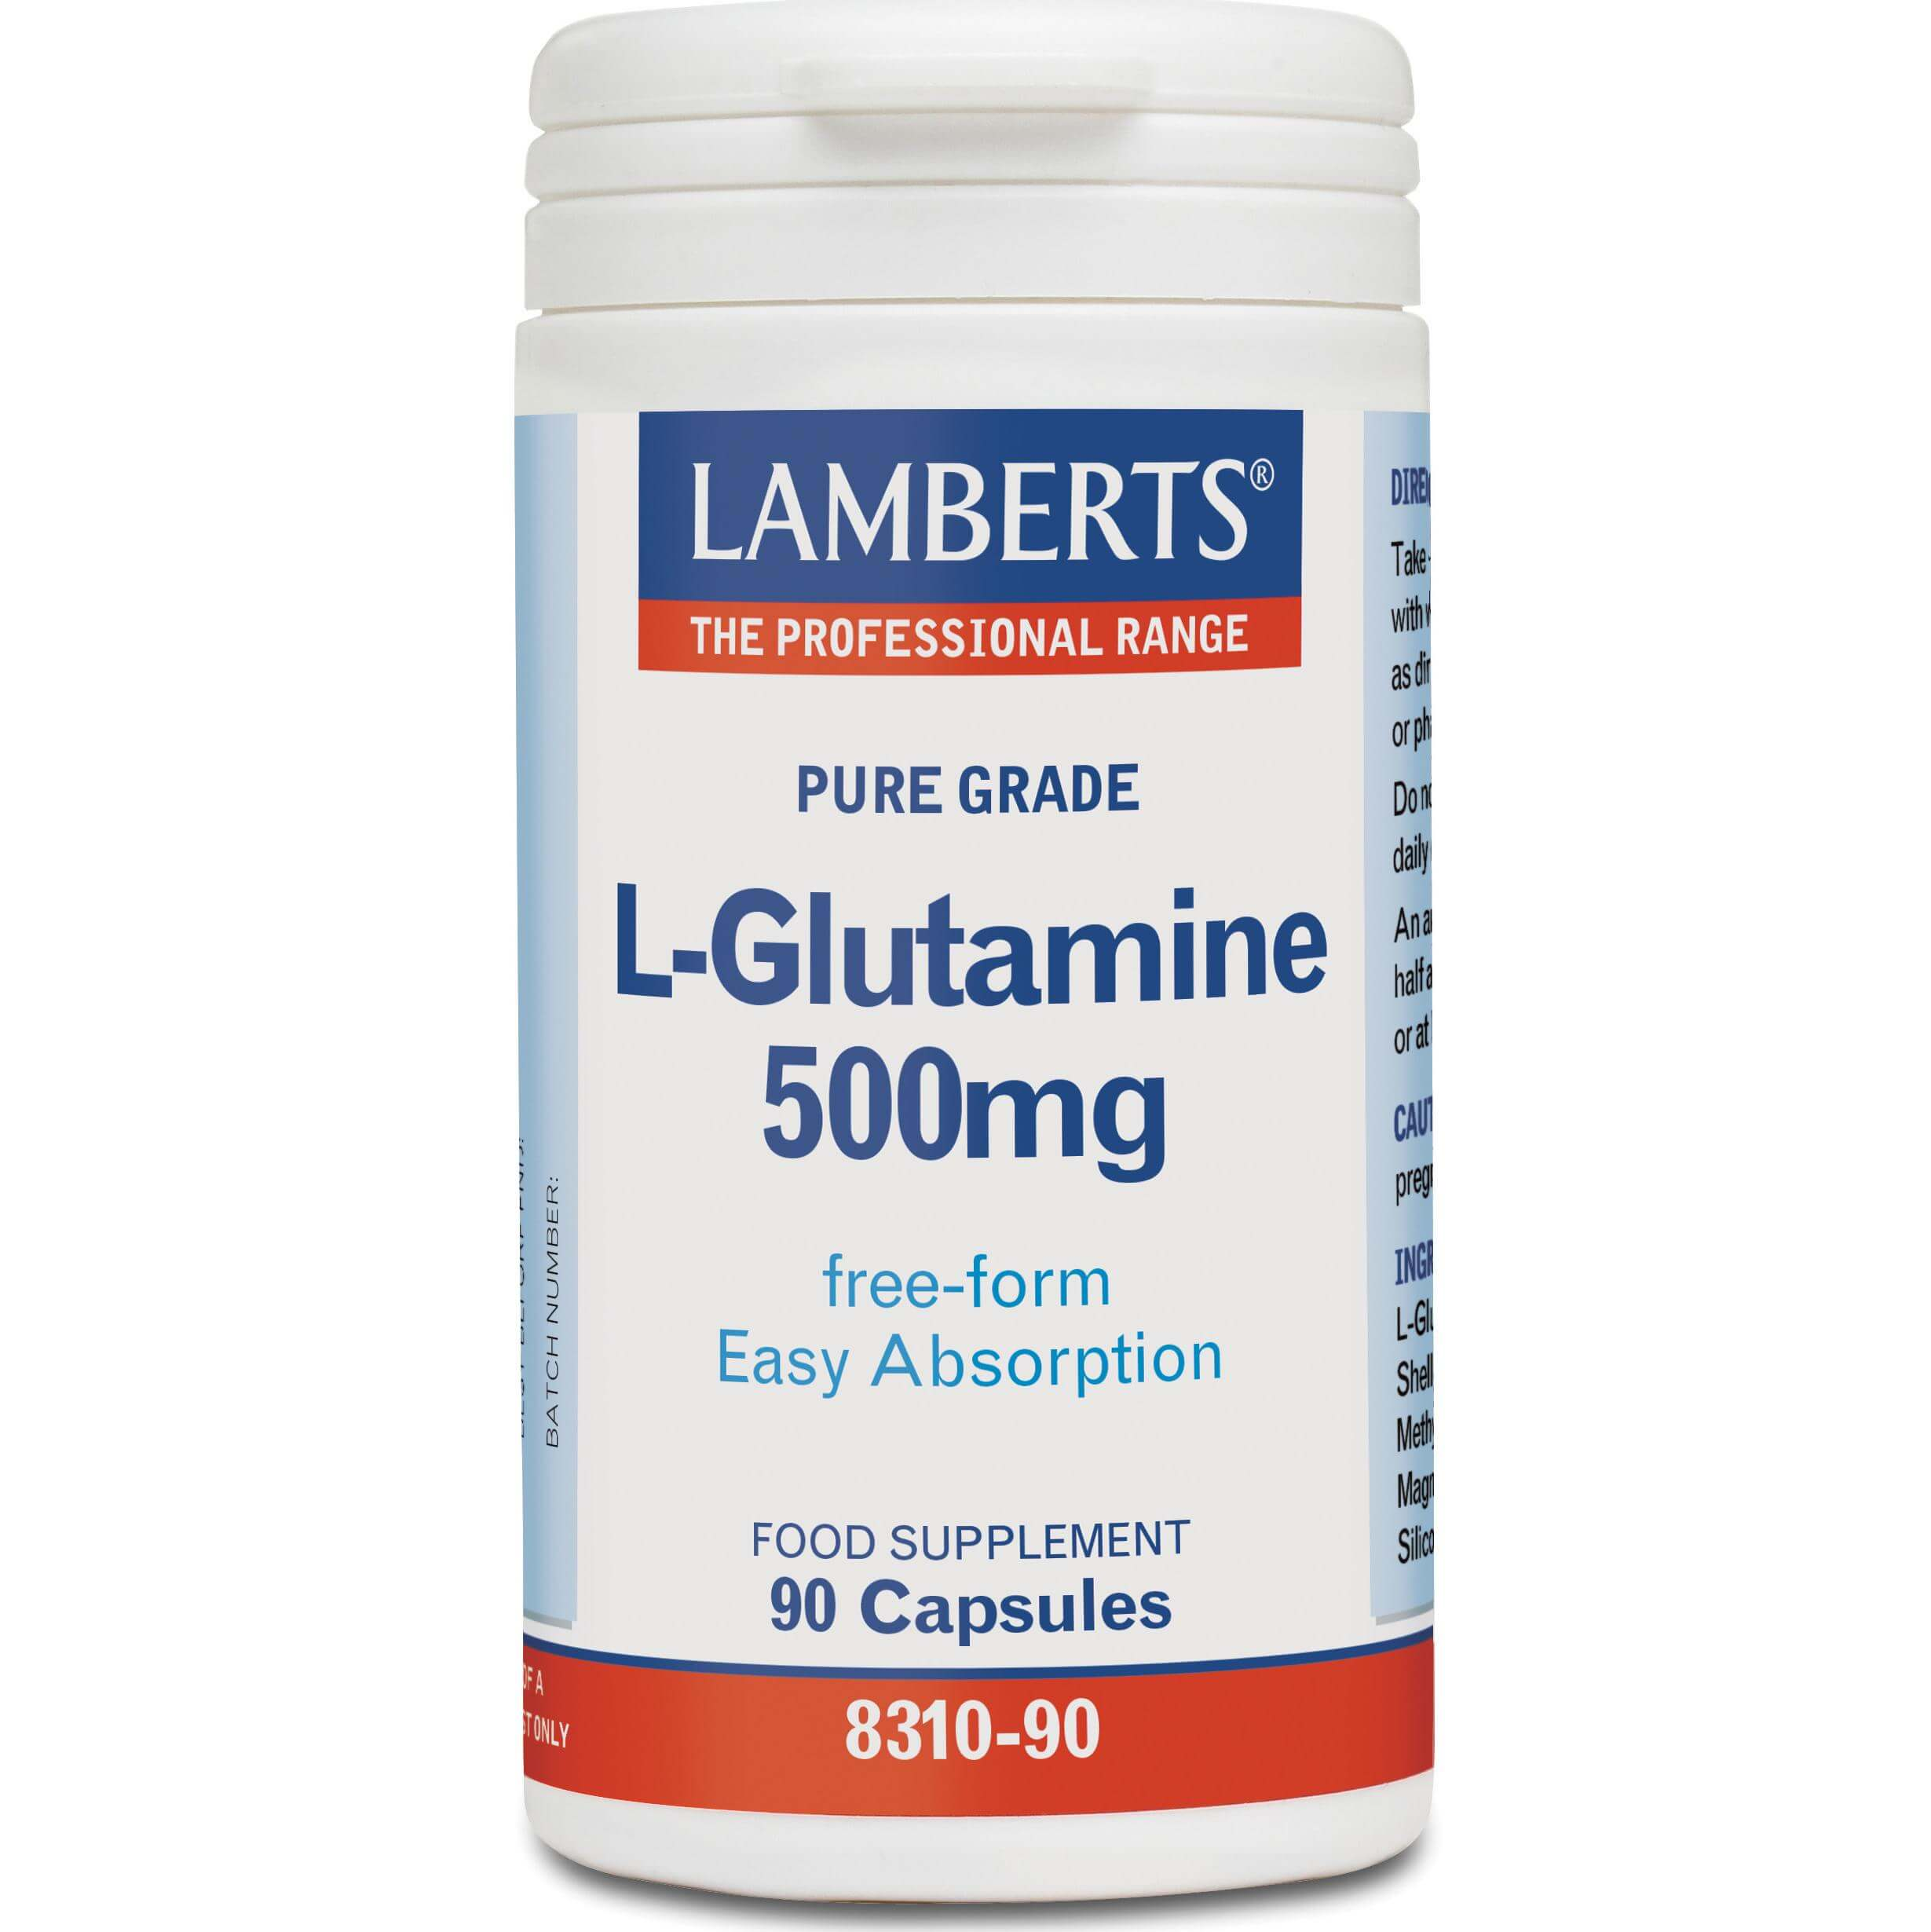 Lamberts L-Glutamine Συμπλήρωμα Διατροφήςγια τη Φυσιολογική Λειτουργία του Εντέρου 500mg 90 caps